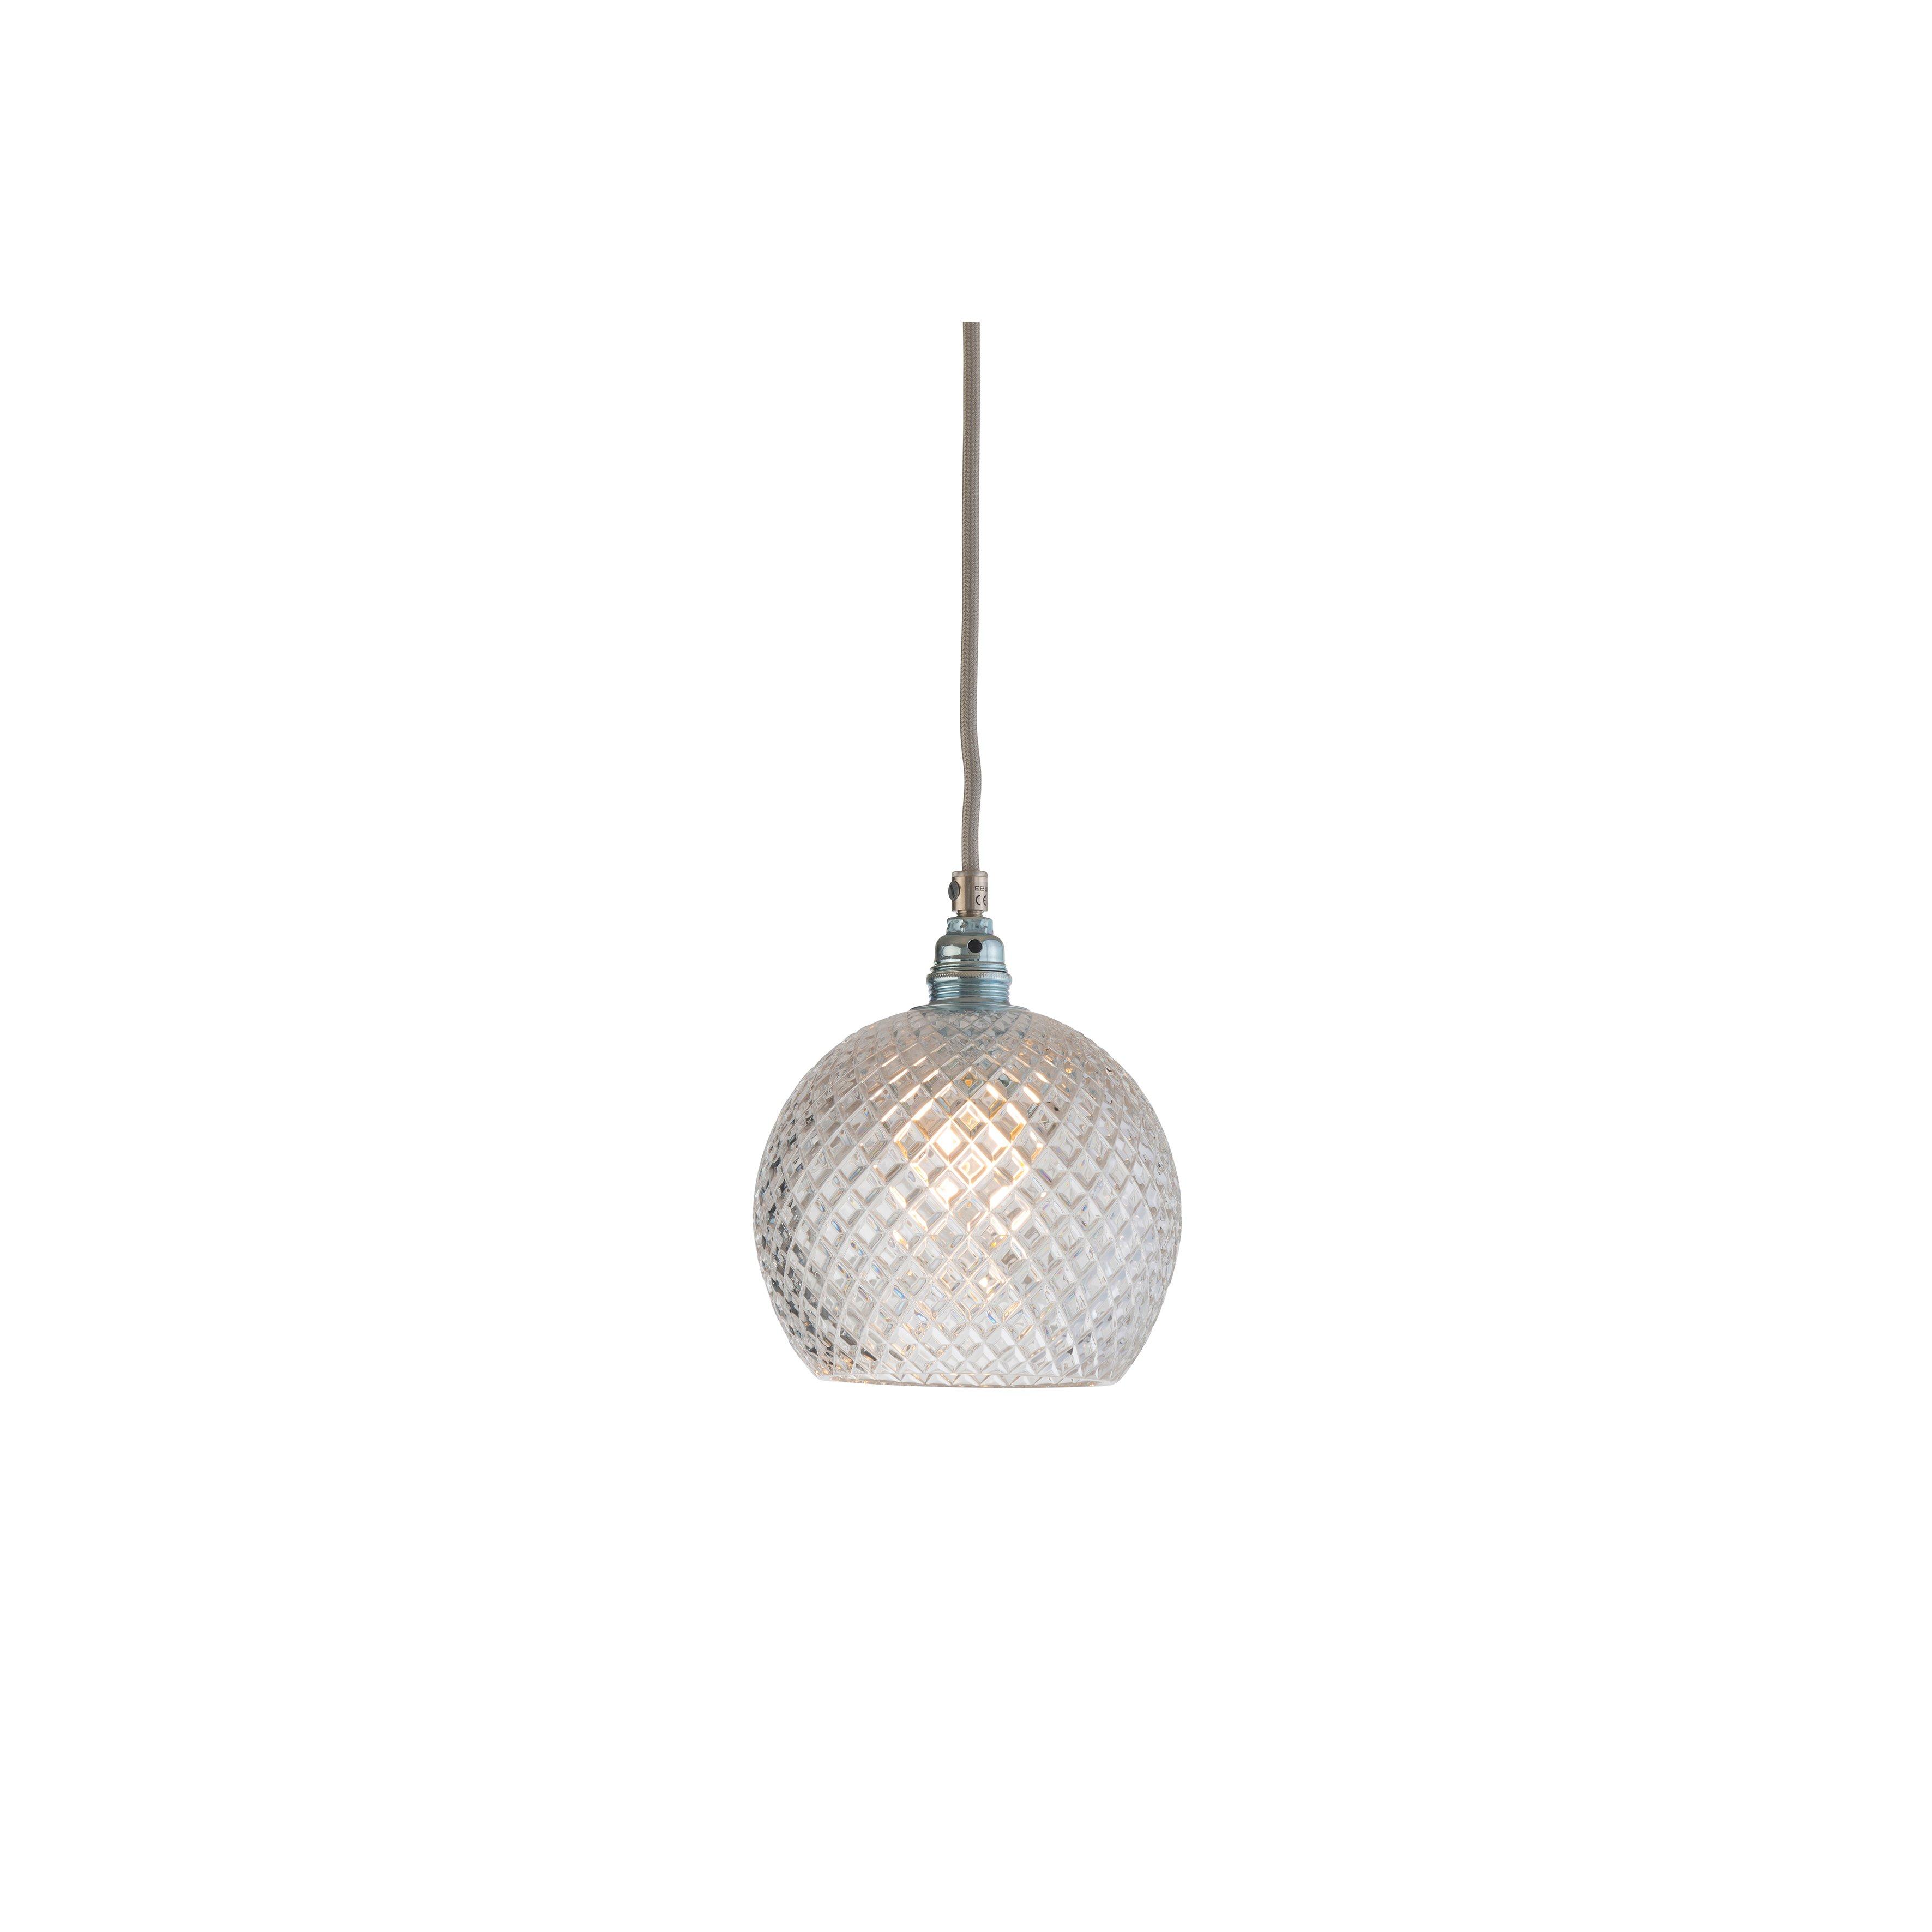 image-Rowan Crystal Pendant Lamp, 15.5cm , Small Check